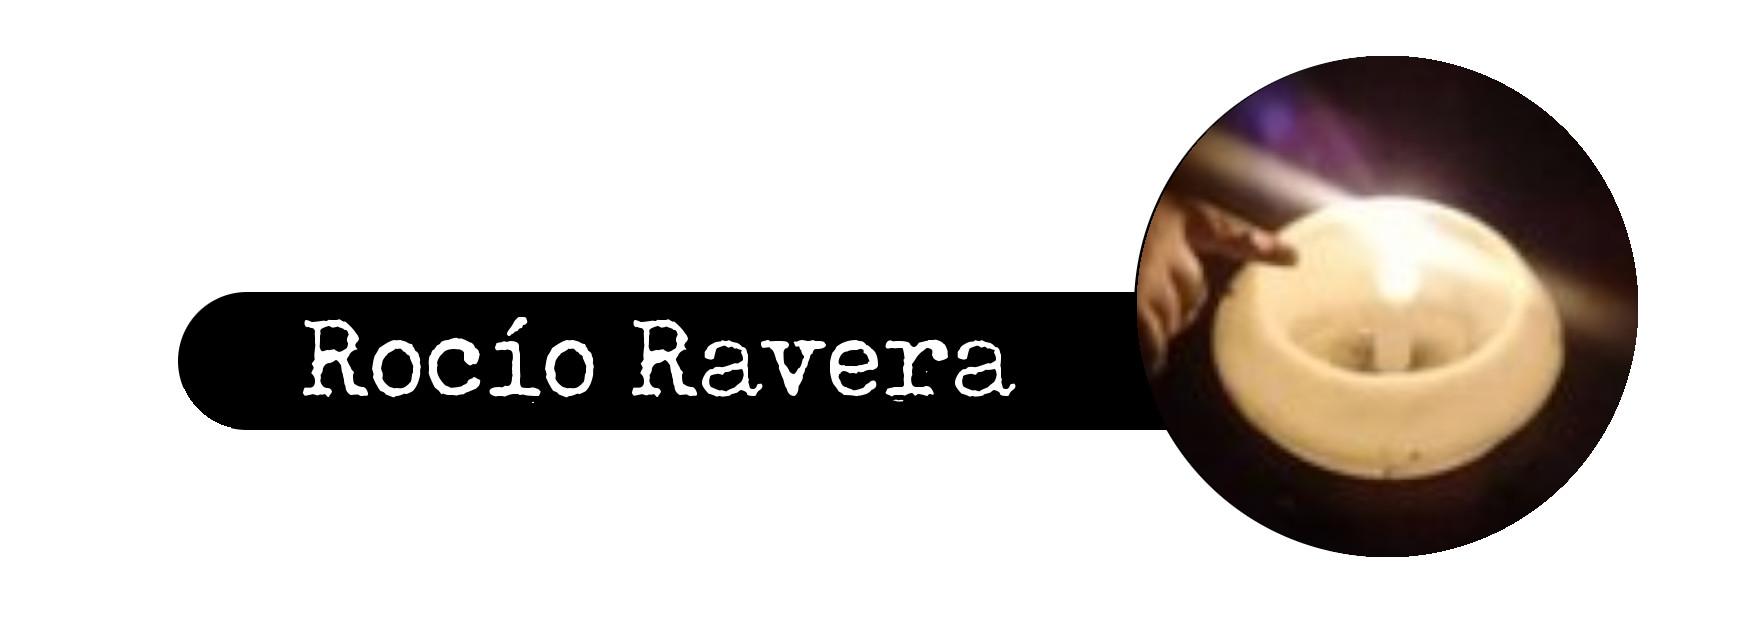 Rocío Ravera